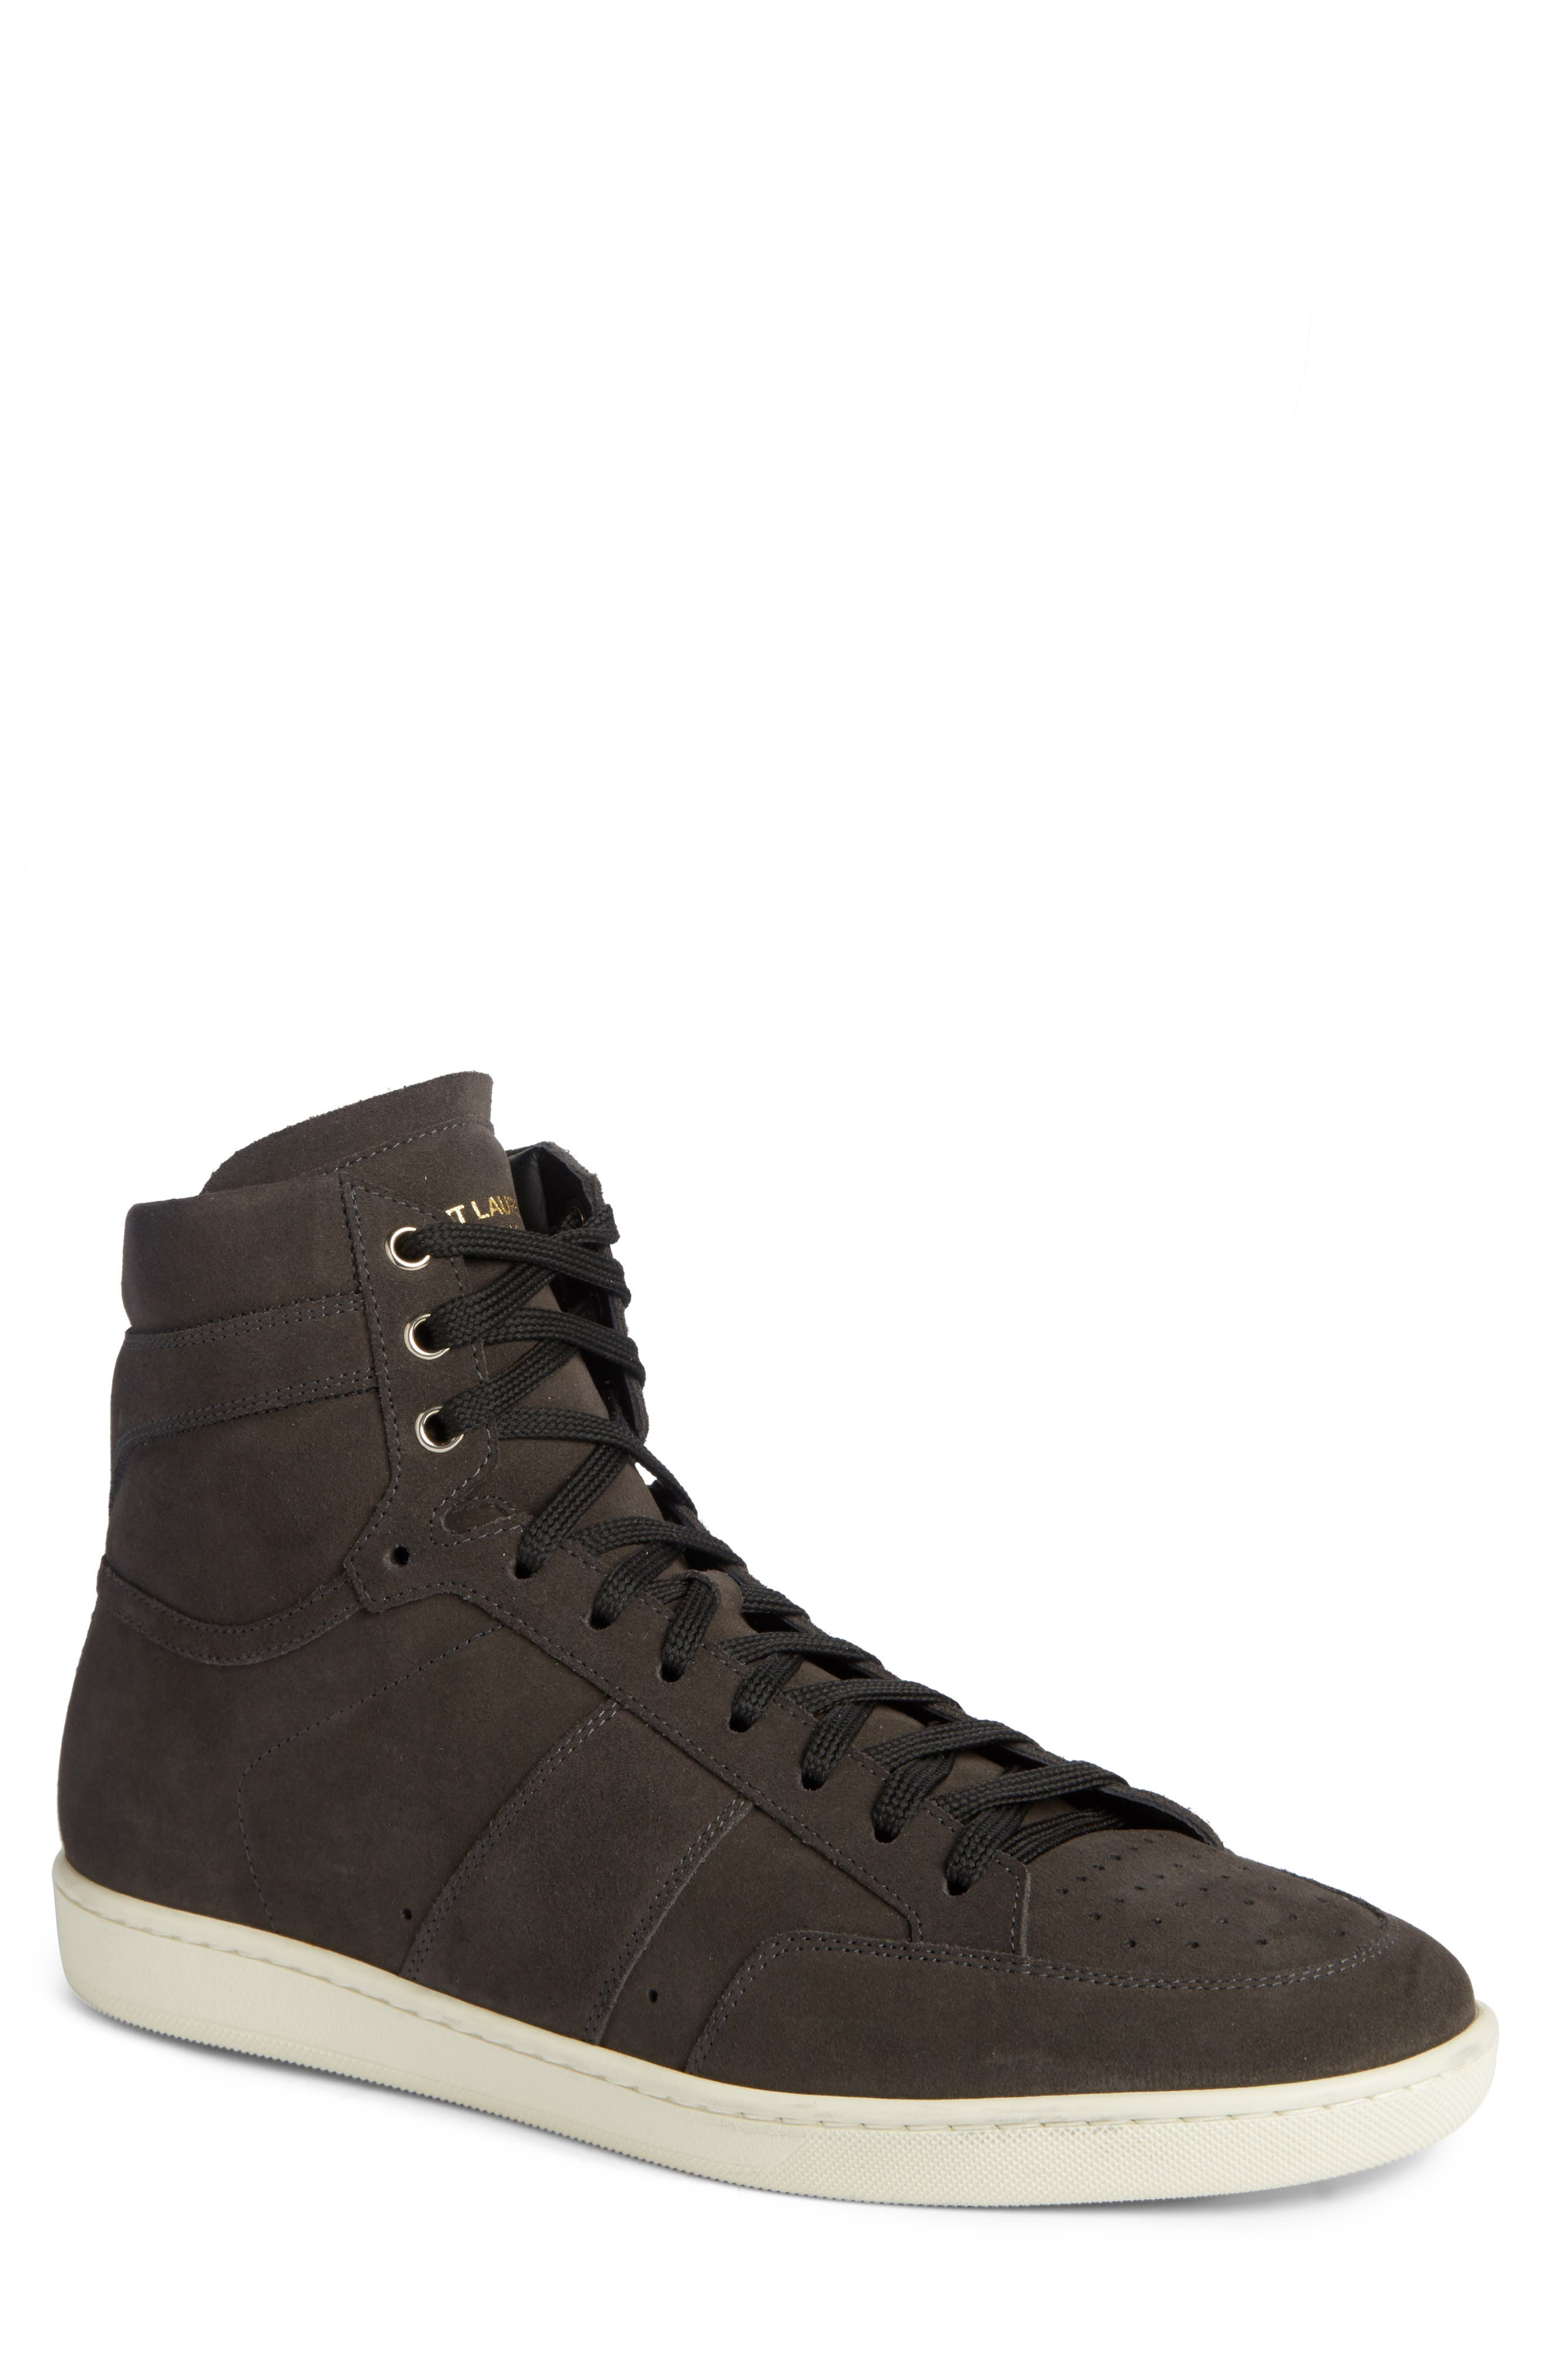 High Top Sneaker, Main, color, 028